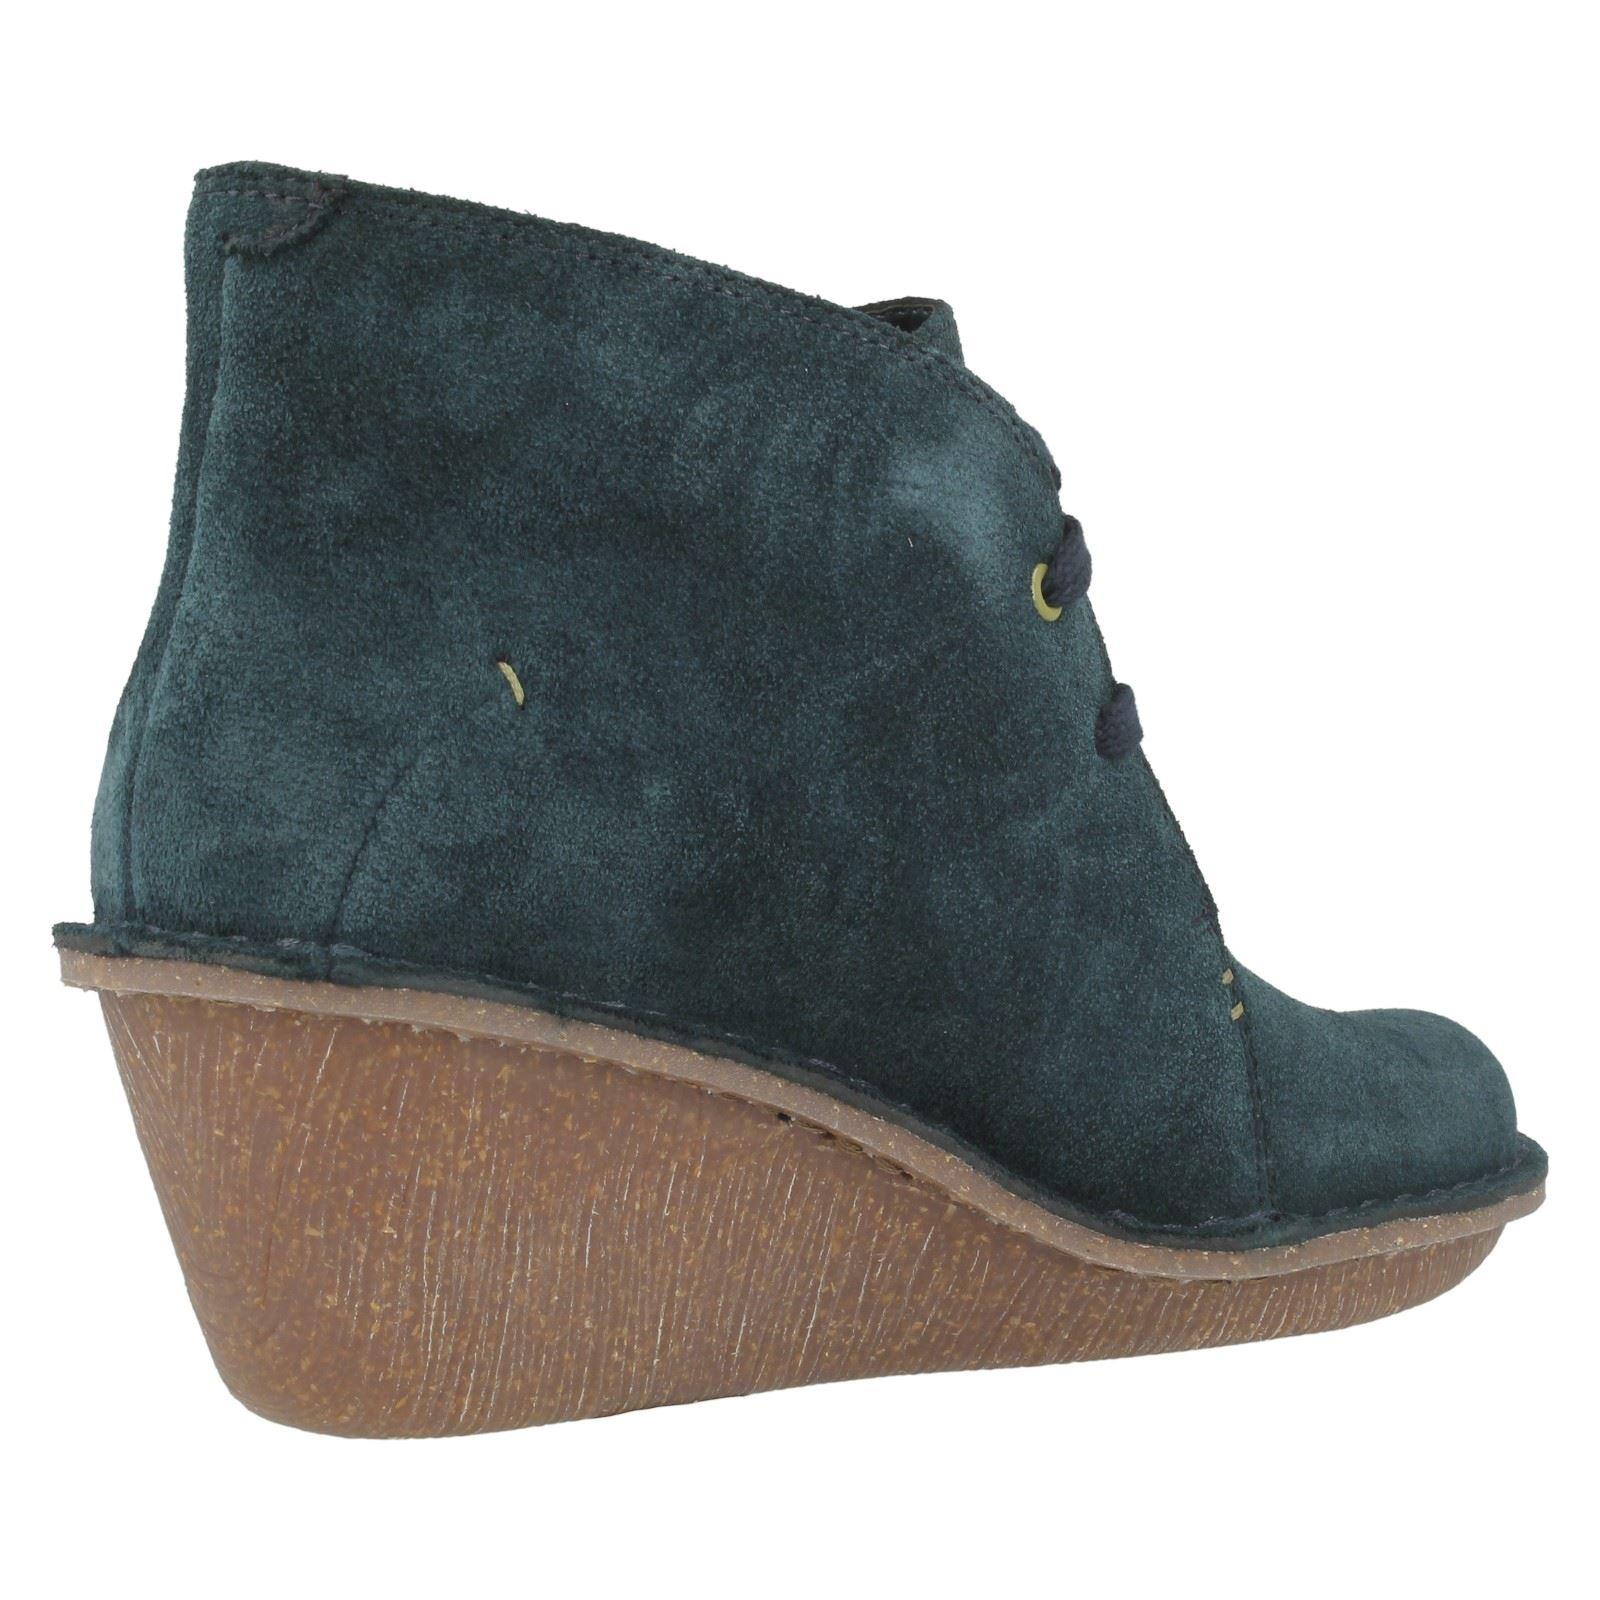 clarks wedge boots marsden ebay